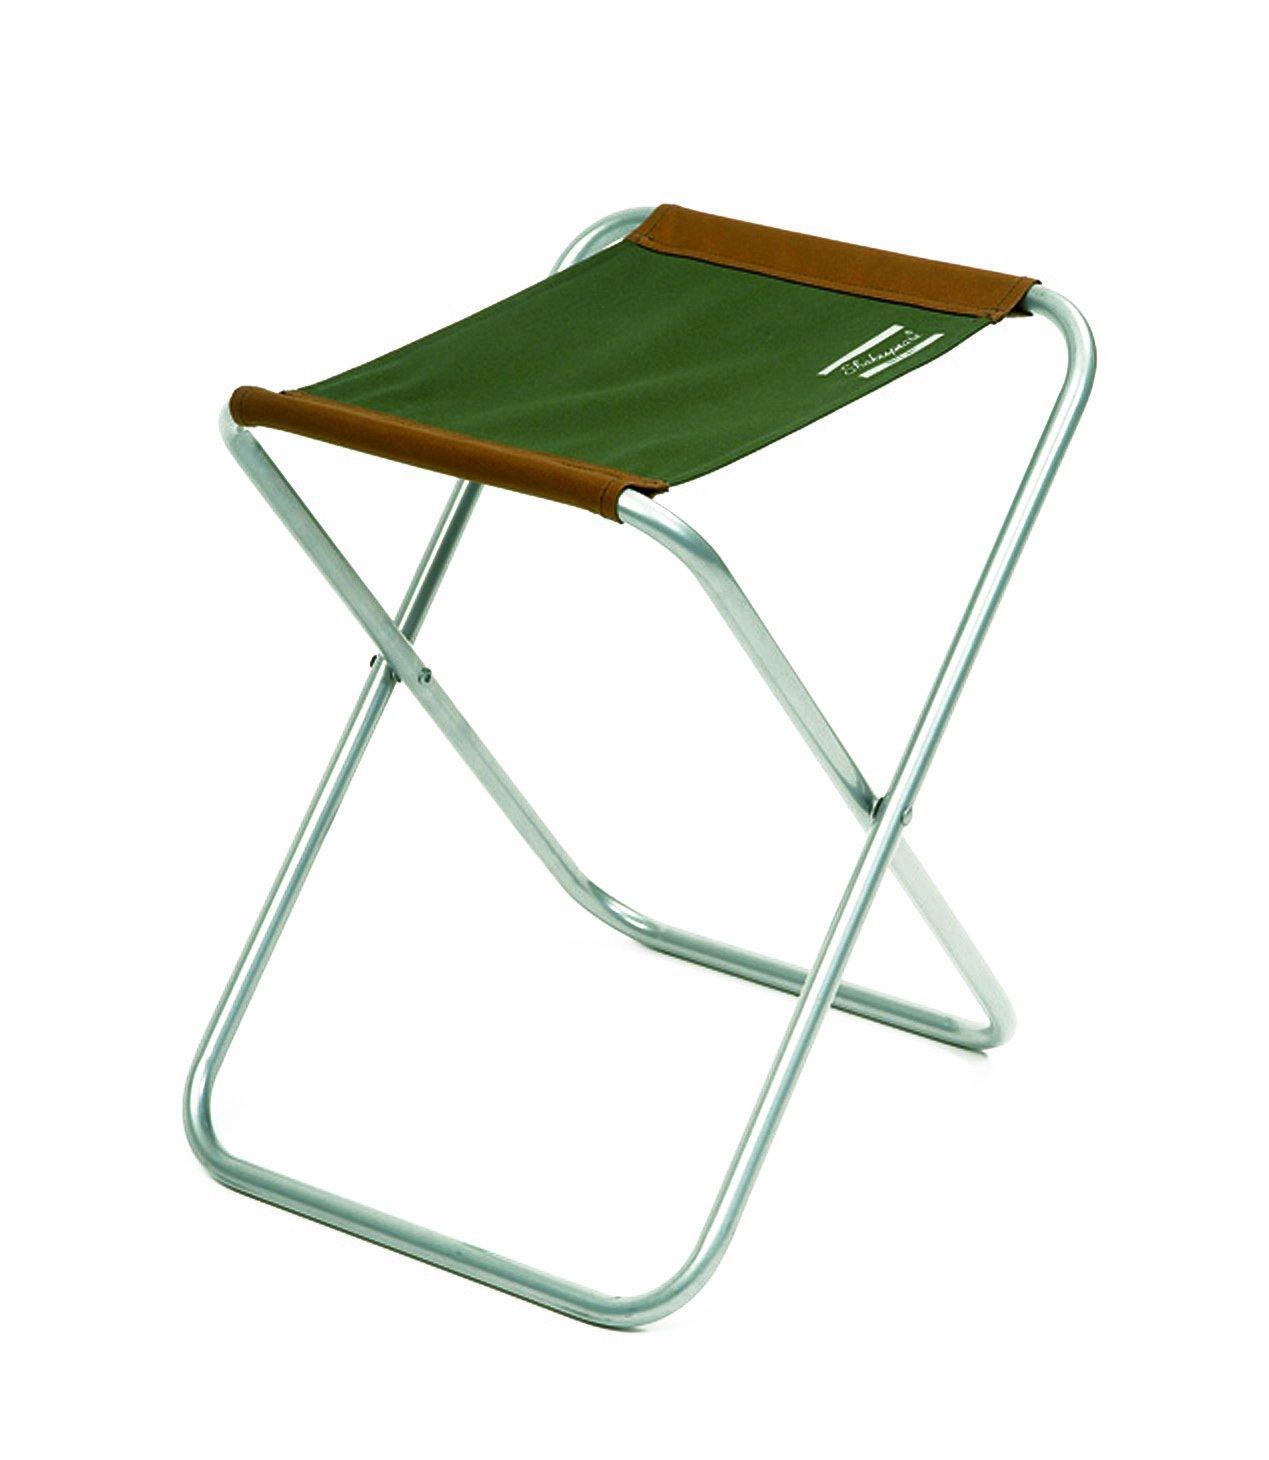 folding sku plastic stool gifts black bk gadgets online l kg electronic p